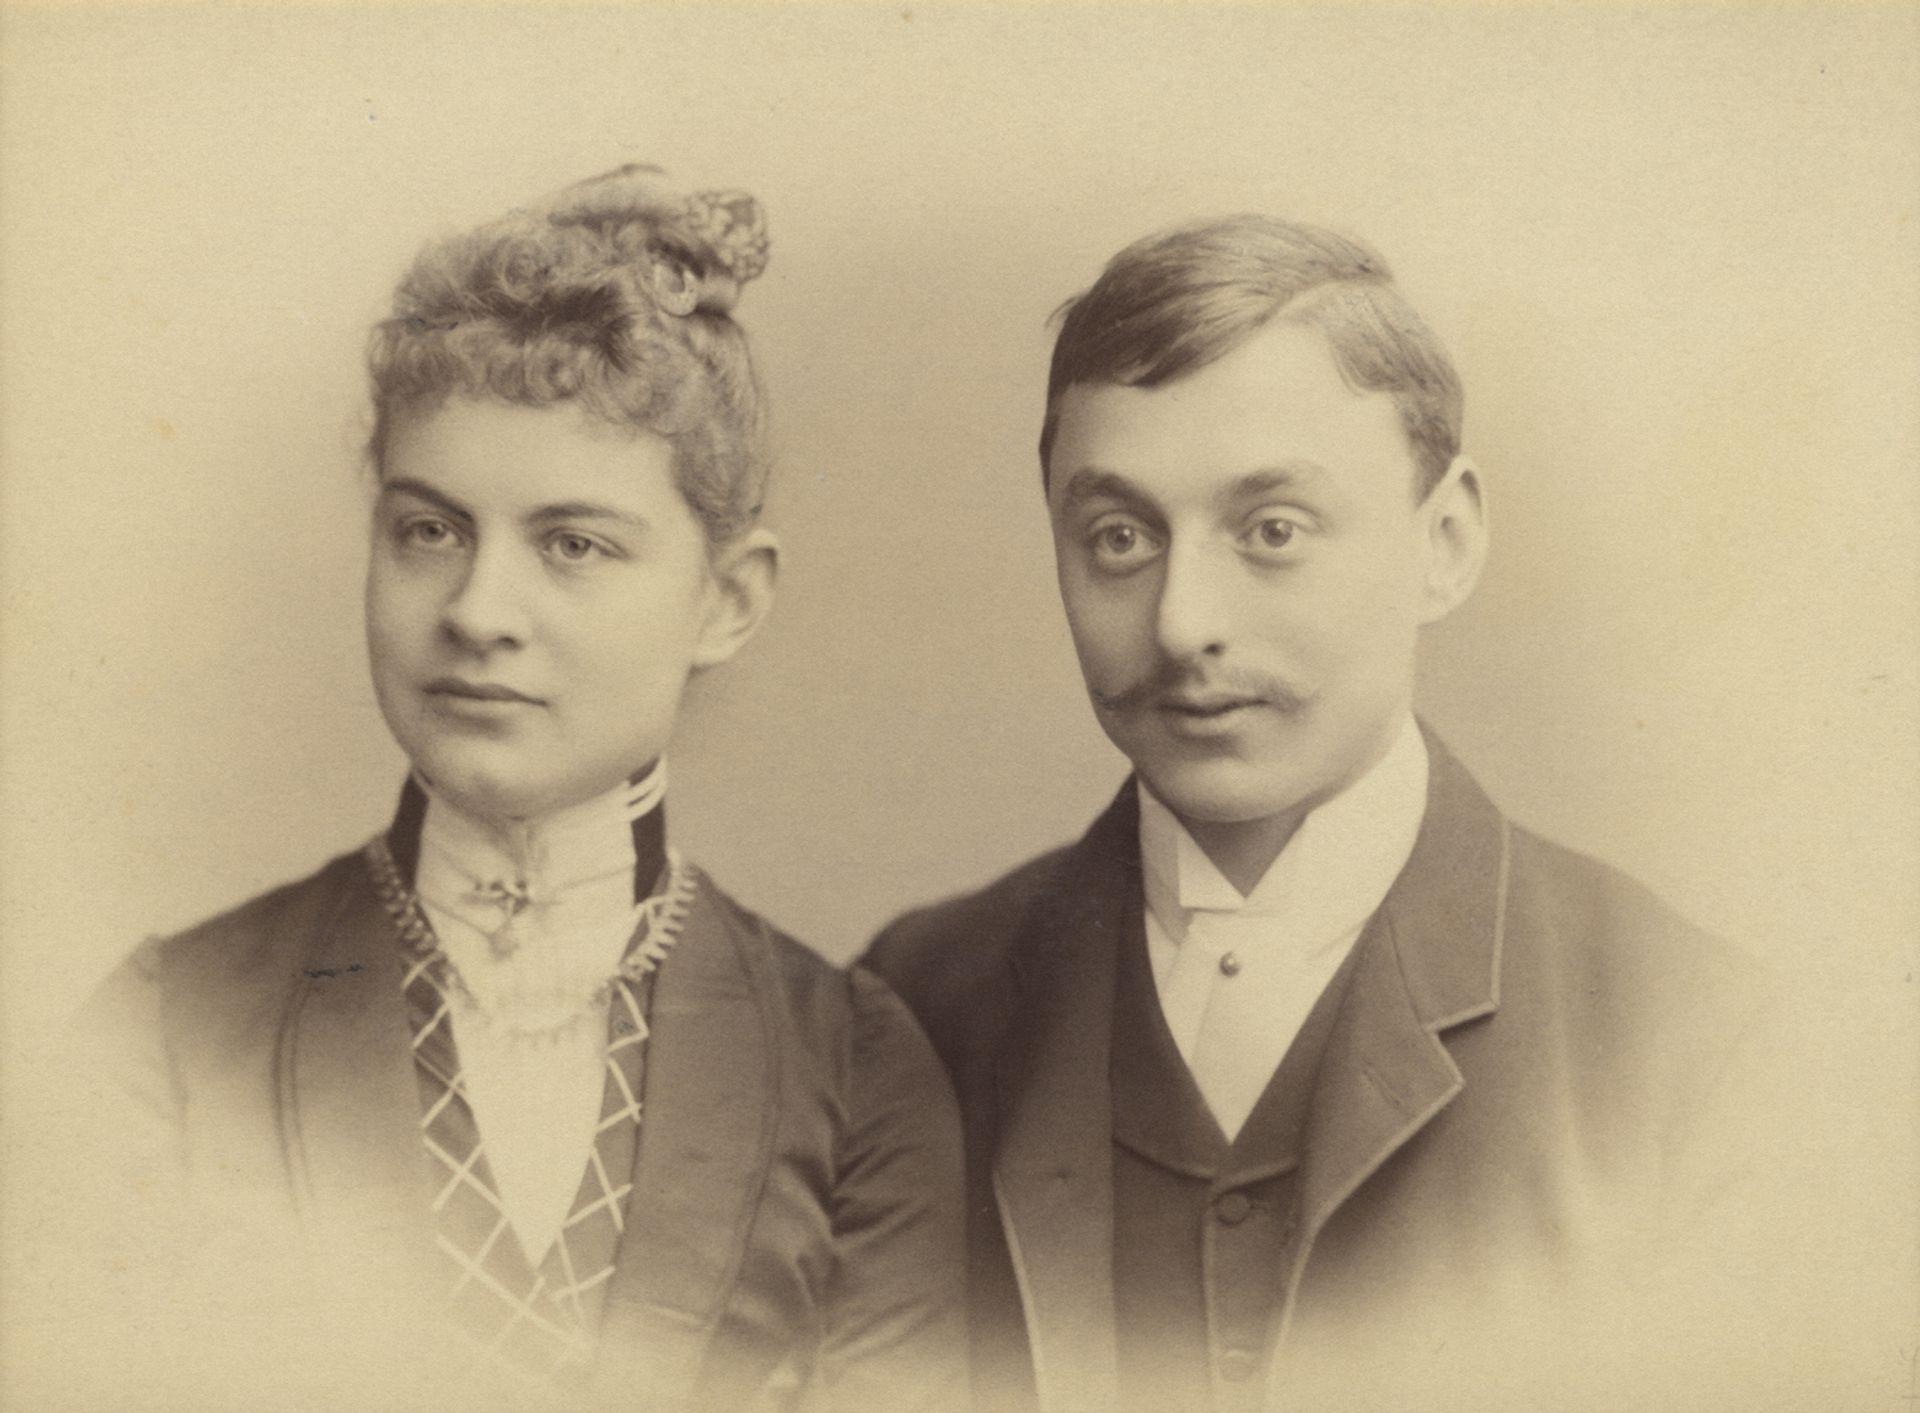 Engagement photograph of Helene Müller and Anton Kröller (1887-88) Courtesy of the Kröller-Müller Museum, Otterlo